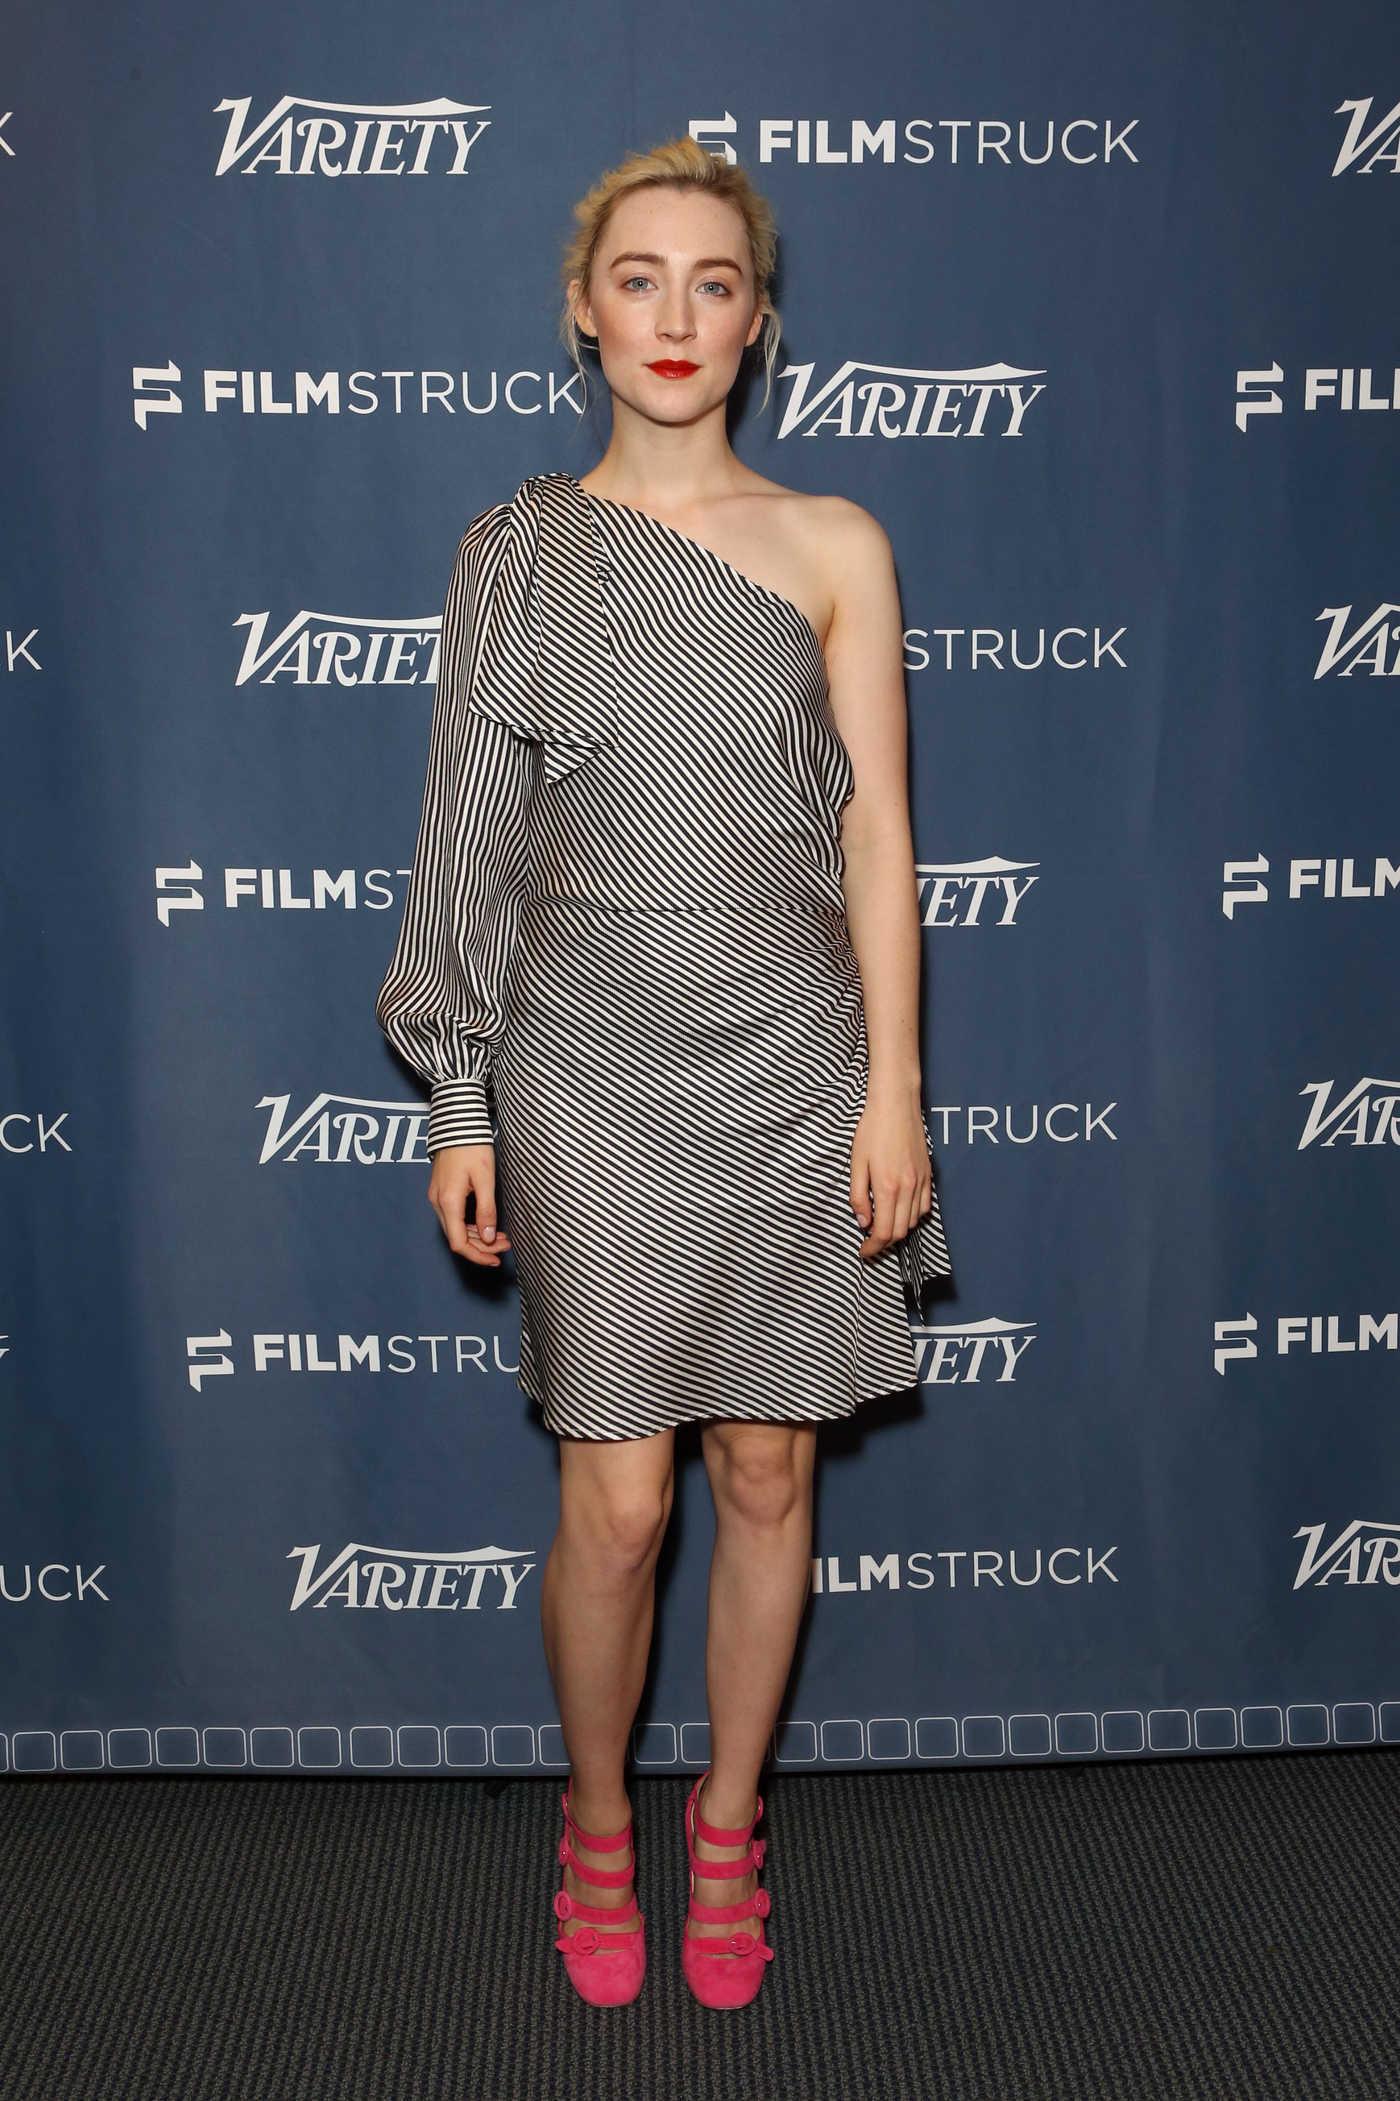 Saoirse Ronan at Lady Bird Variety Screening Series Presented by FilmStruck in Los Angeles 11/09/2017